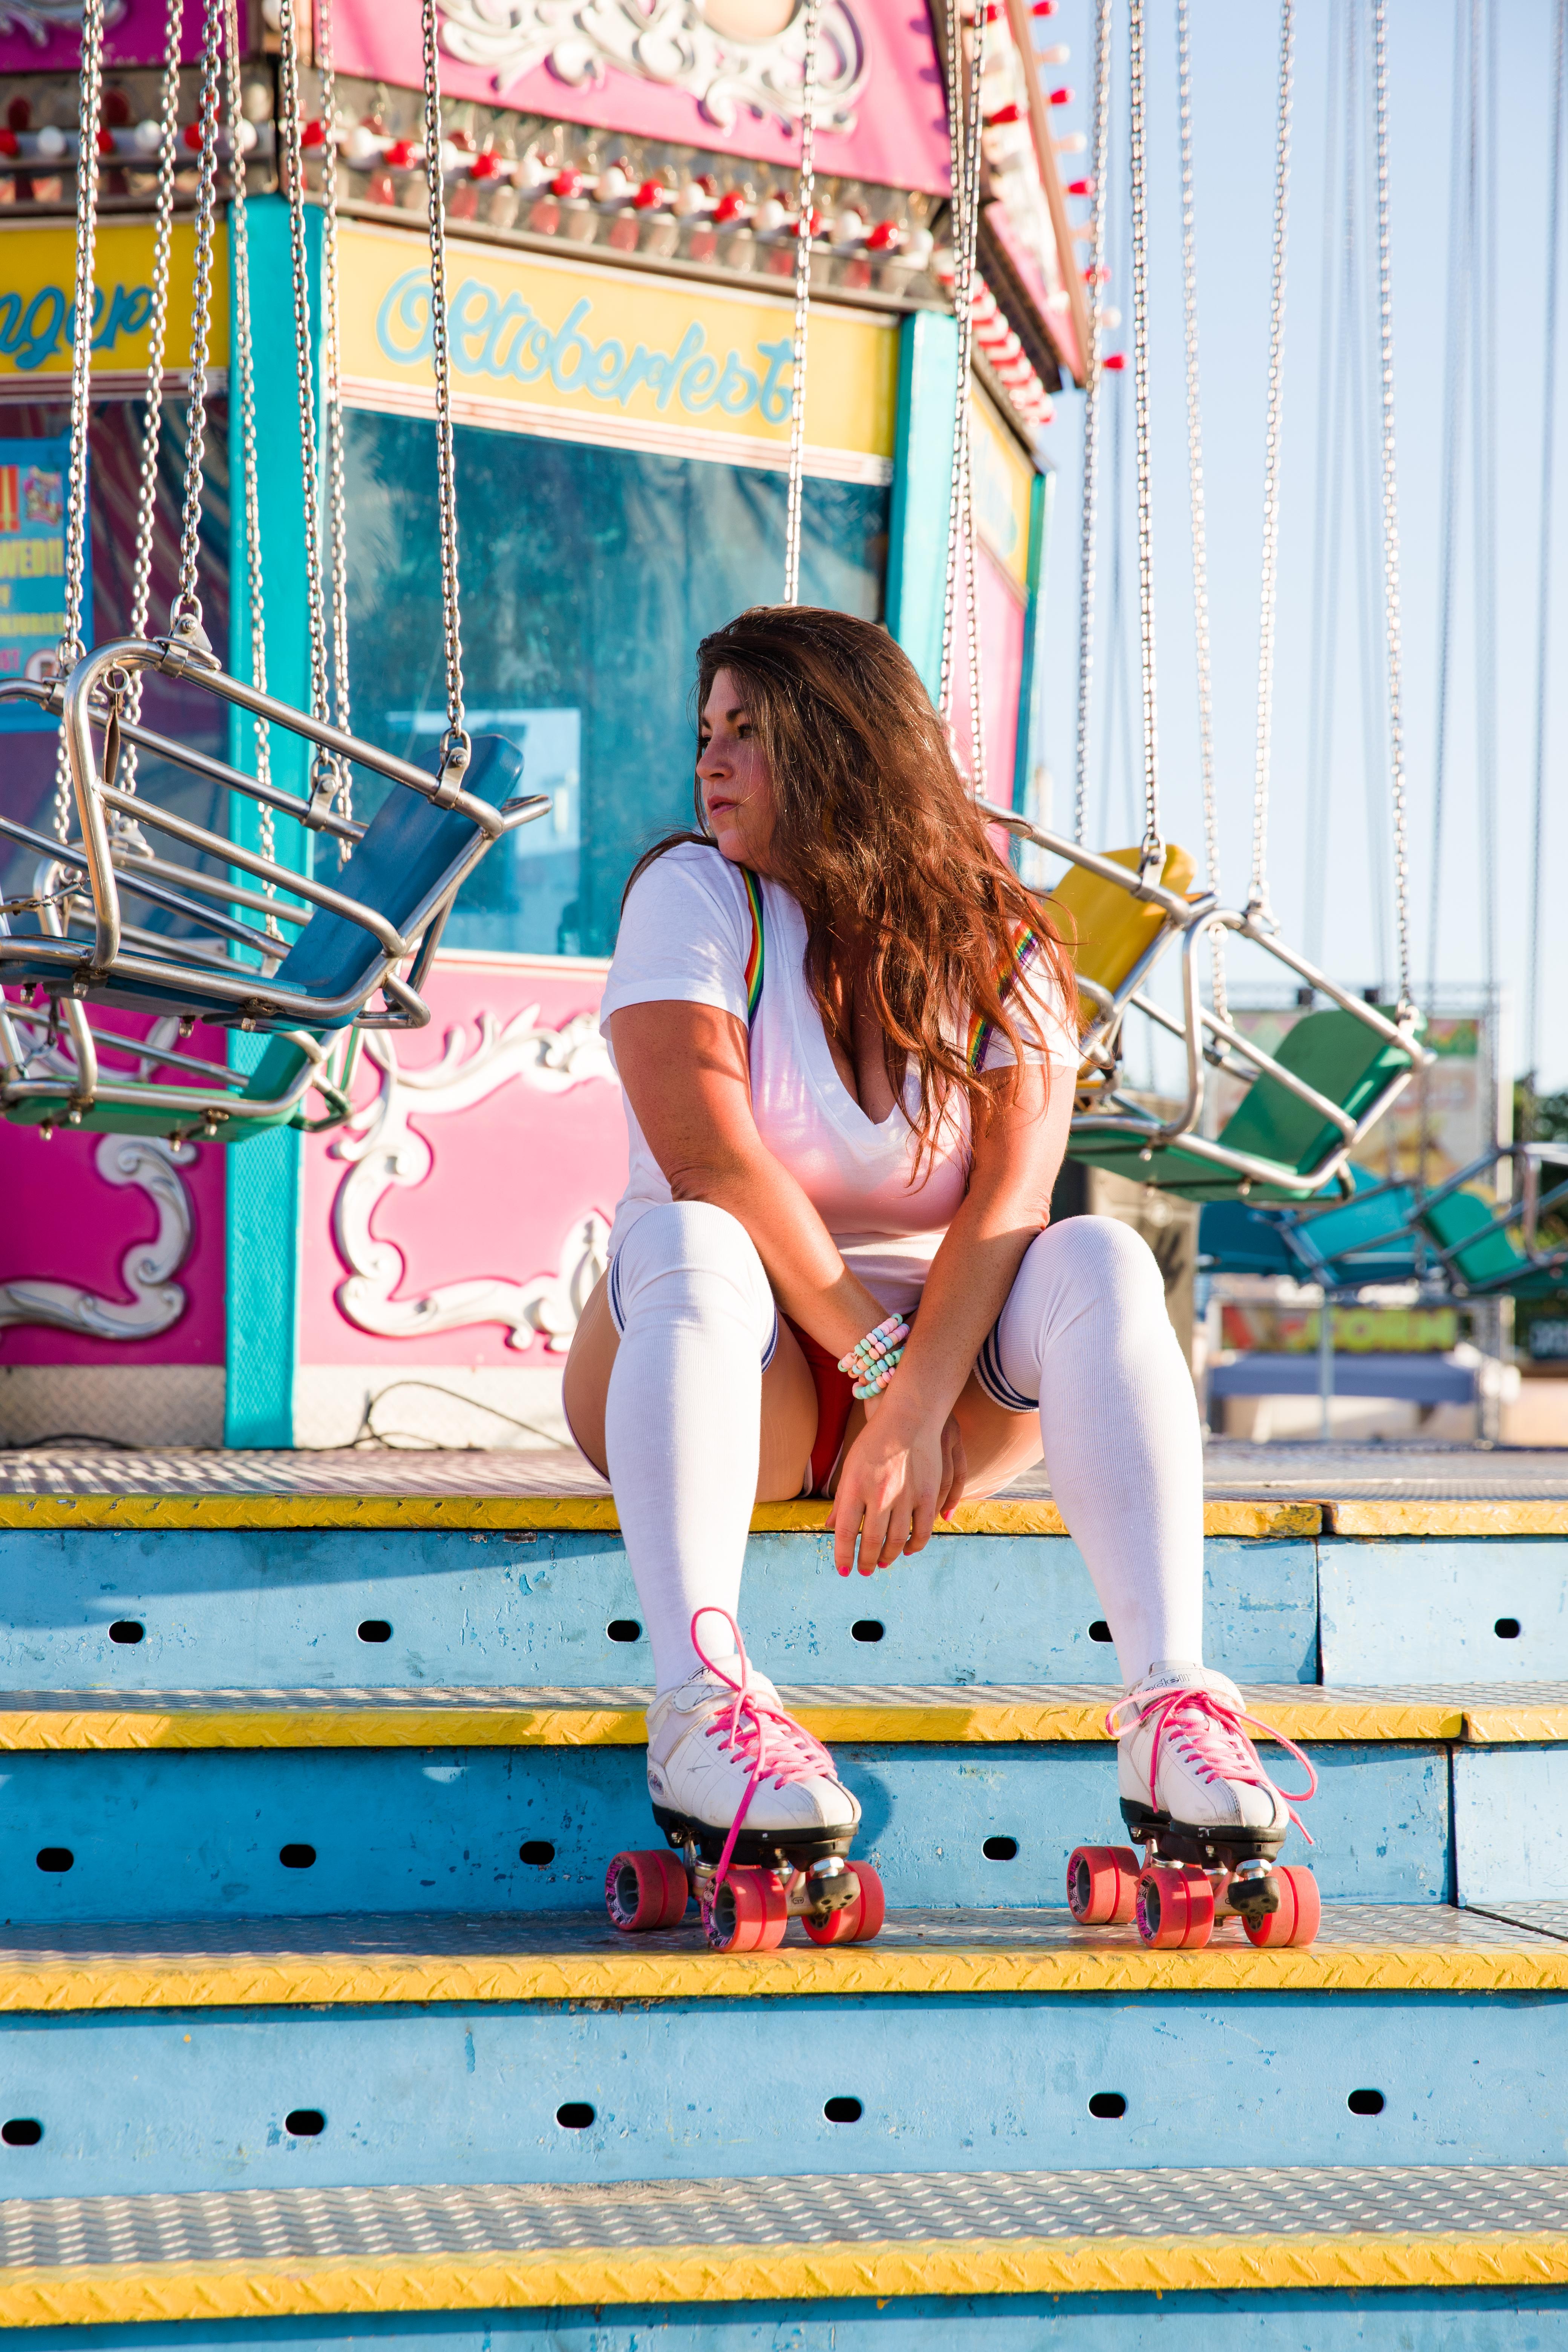 roller skating badass chick